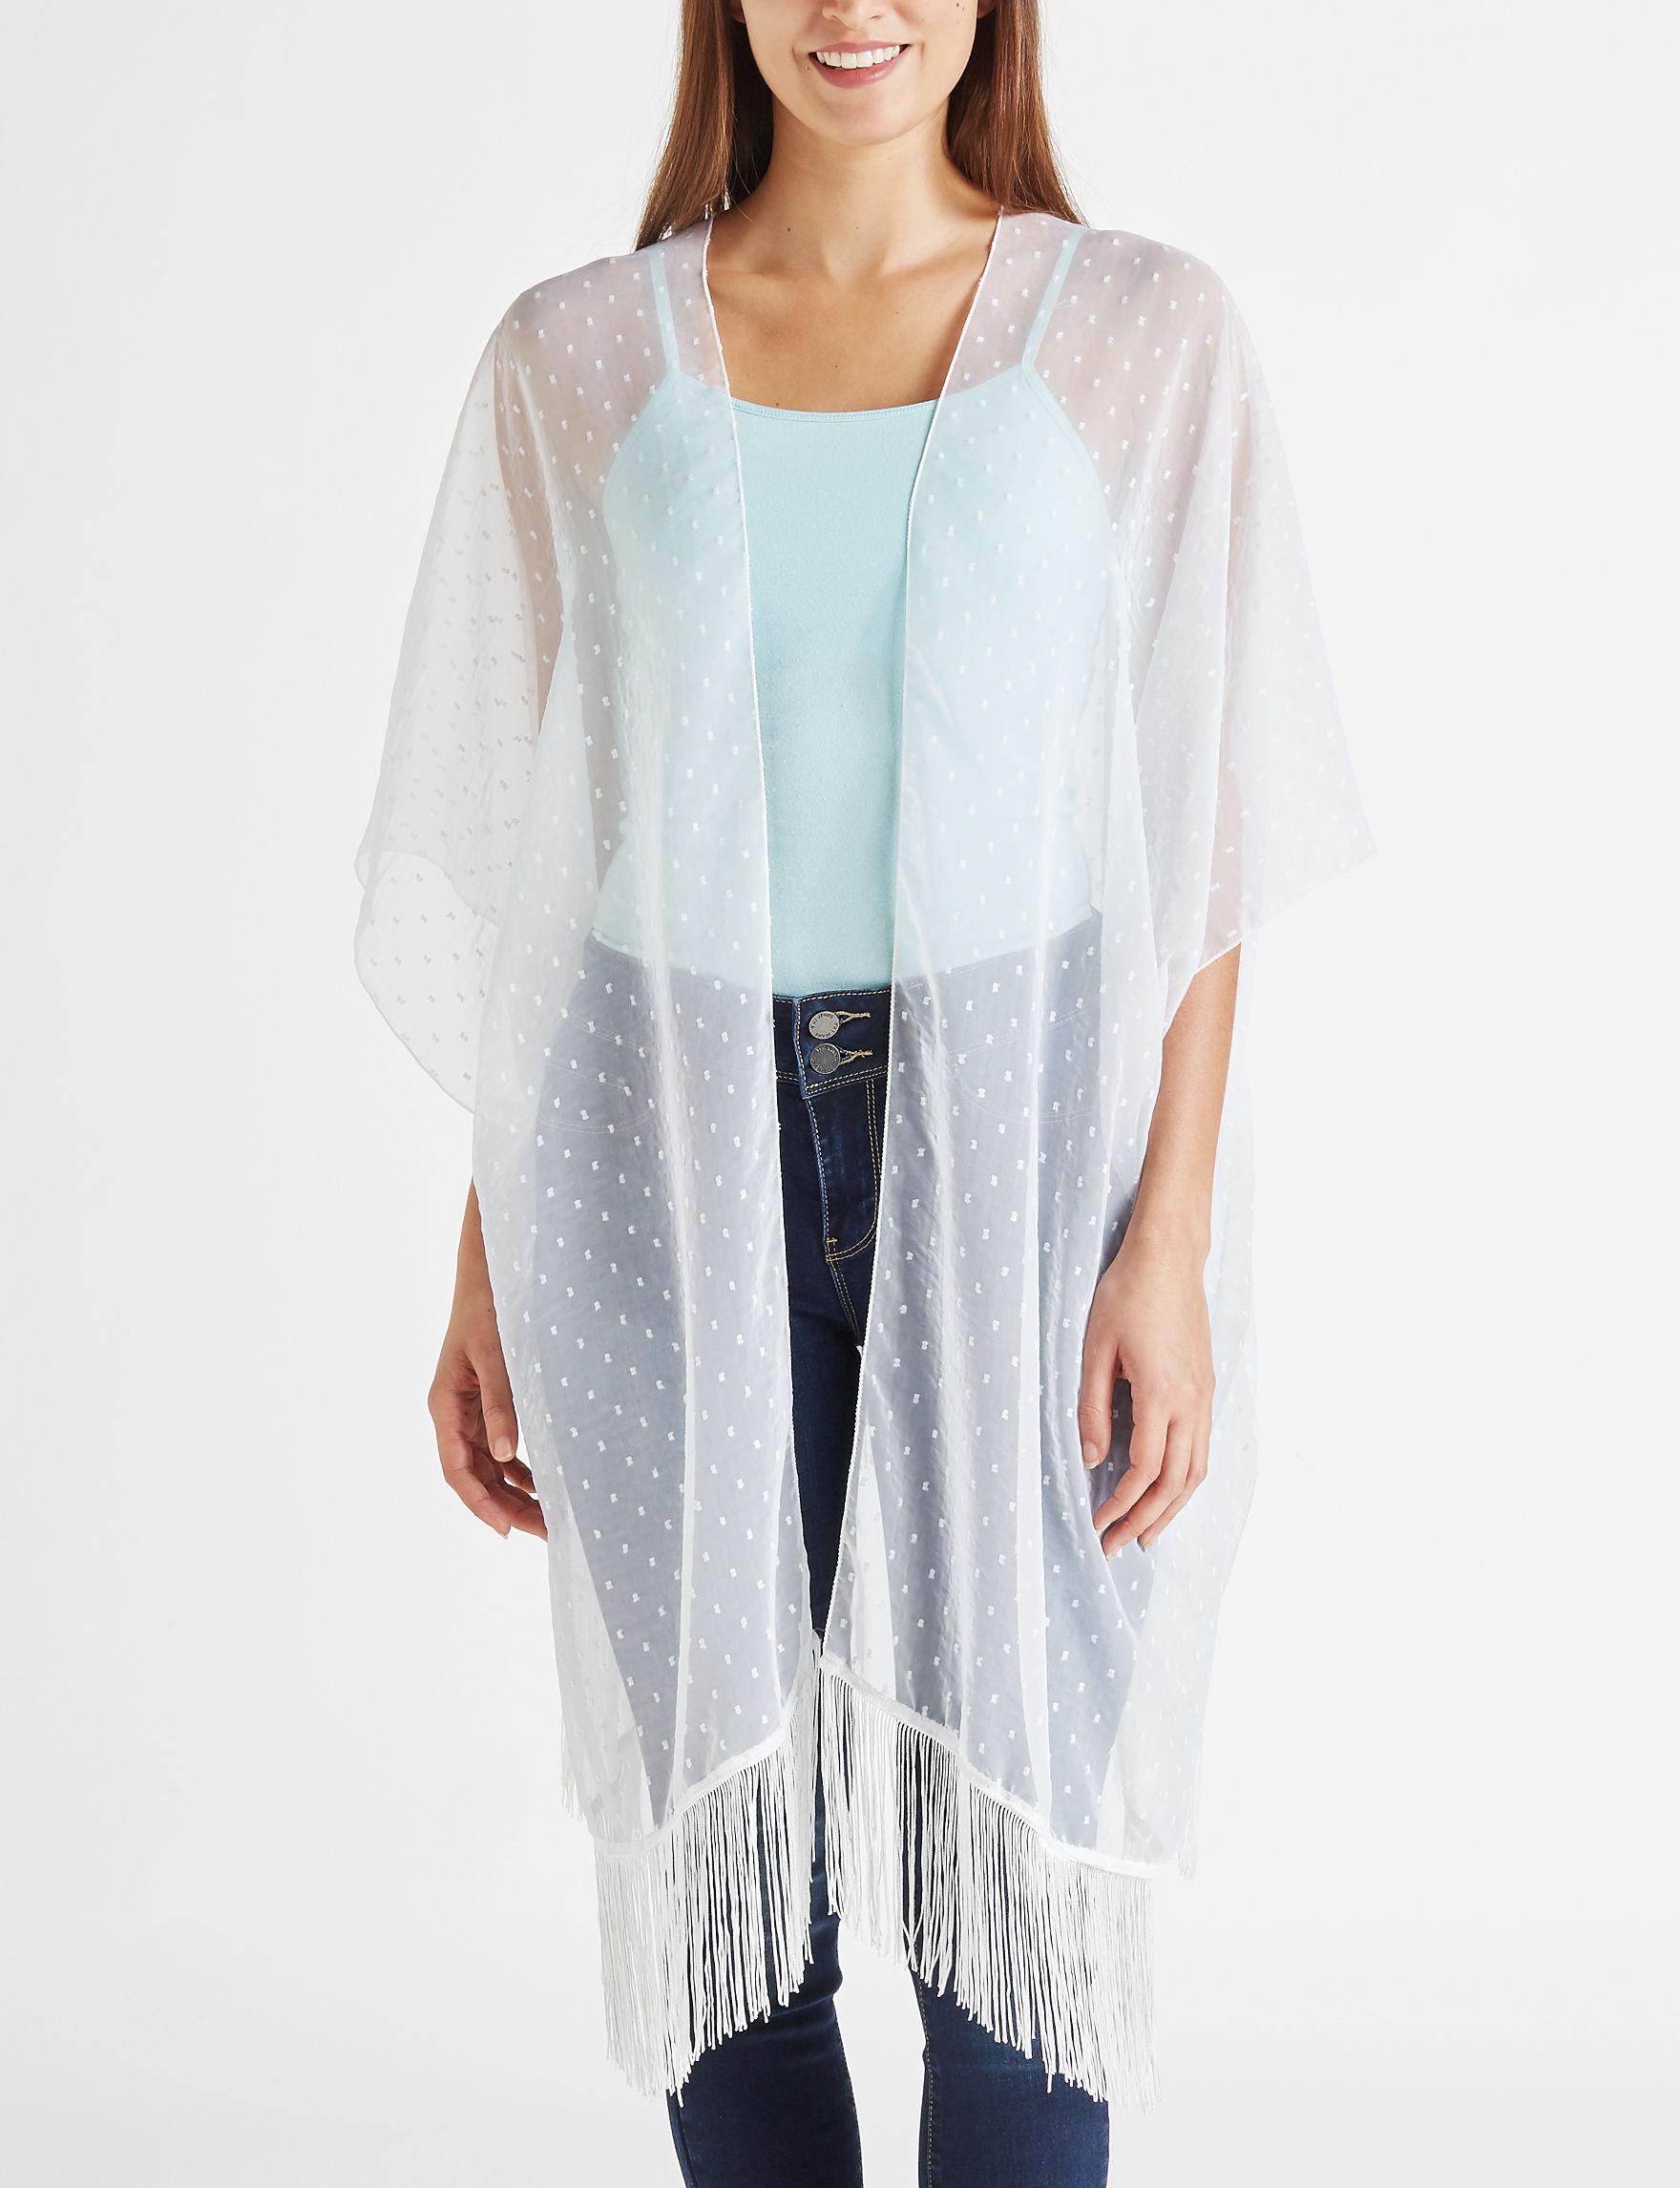 Lake Shore Drive White Kimonos & Toppers